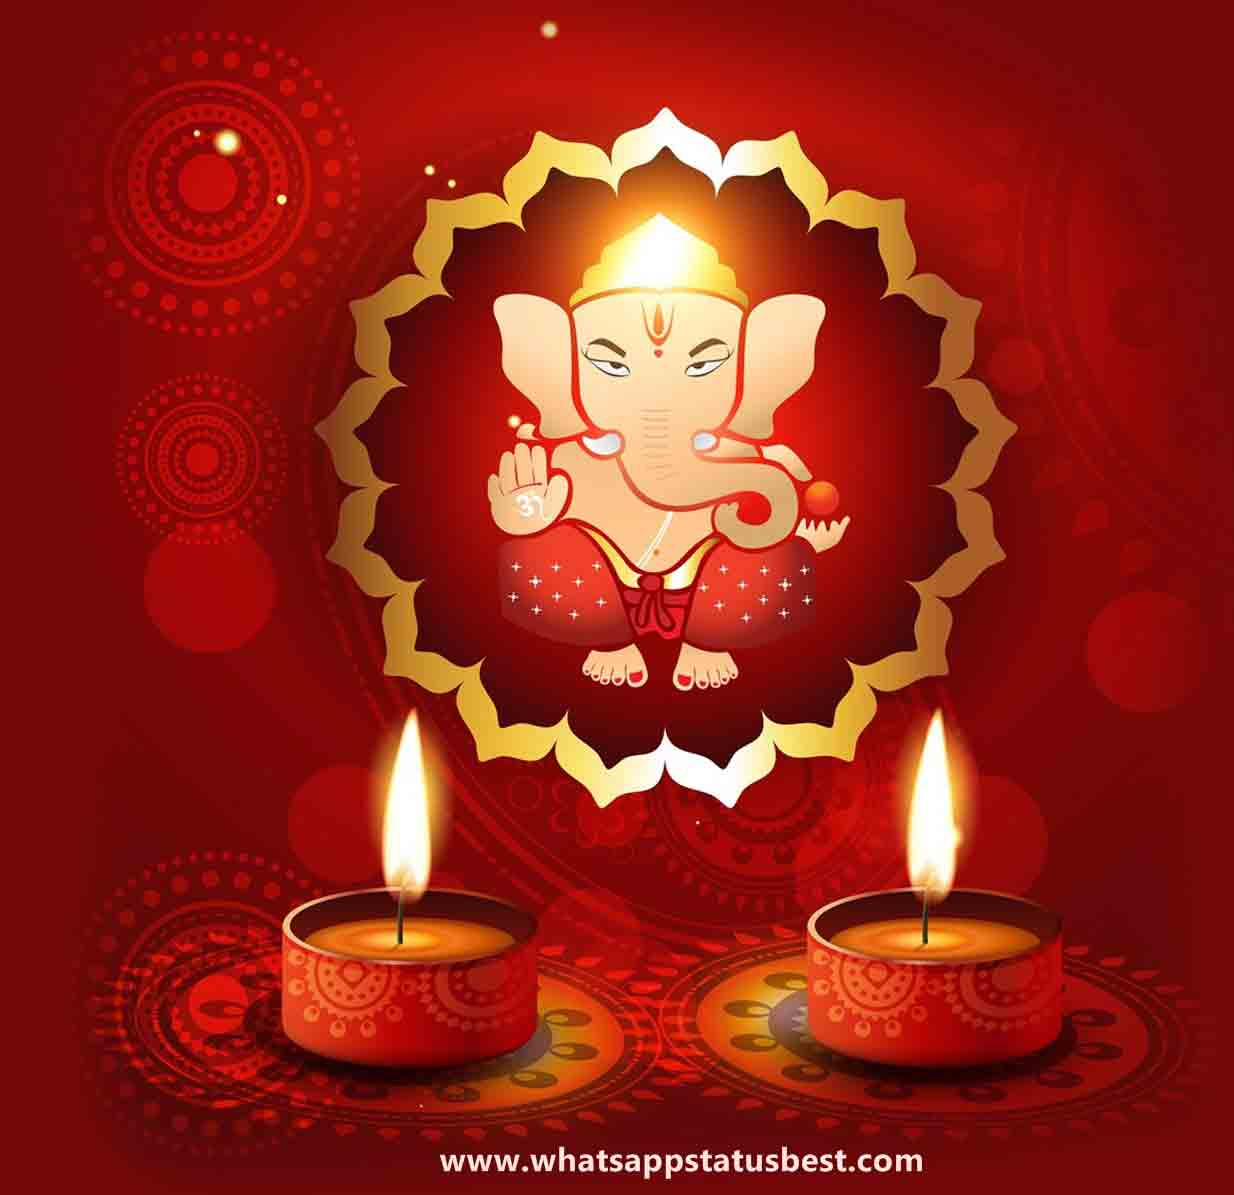 Ganpati Blessing Quotes: Ganesh Chaturthi Status In Marathi Language : Best Marathi